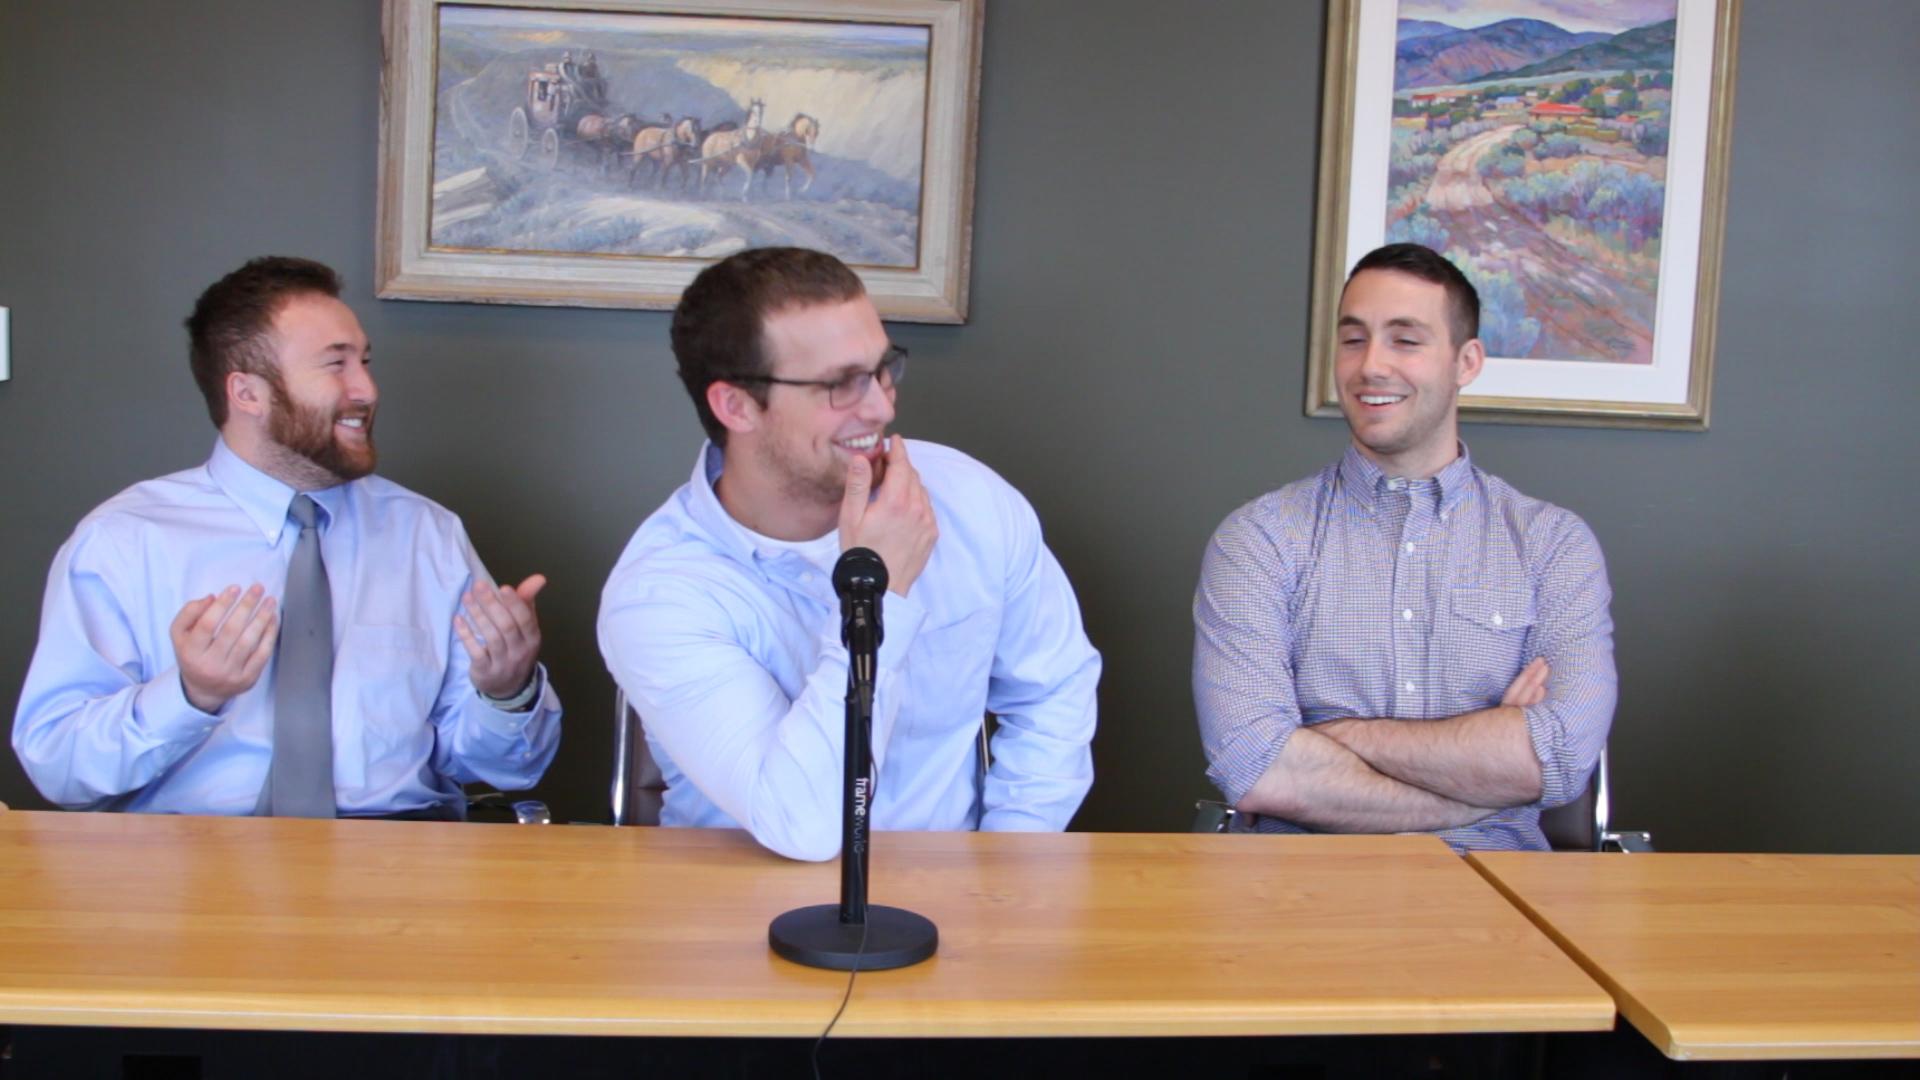 Cory McKane, Ian Bouchard, And Cy Zellner. The original WeStrive team